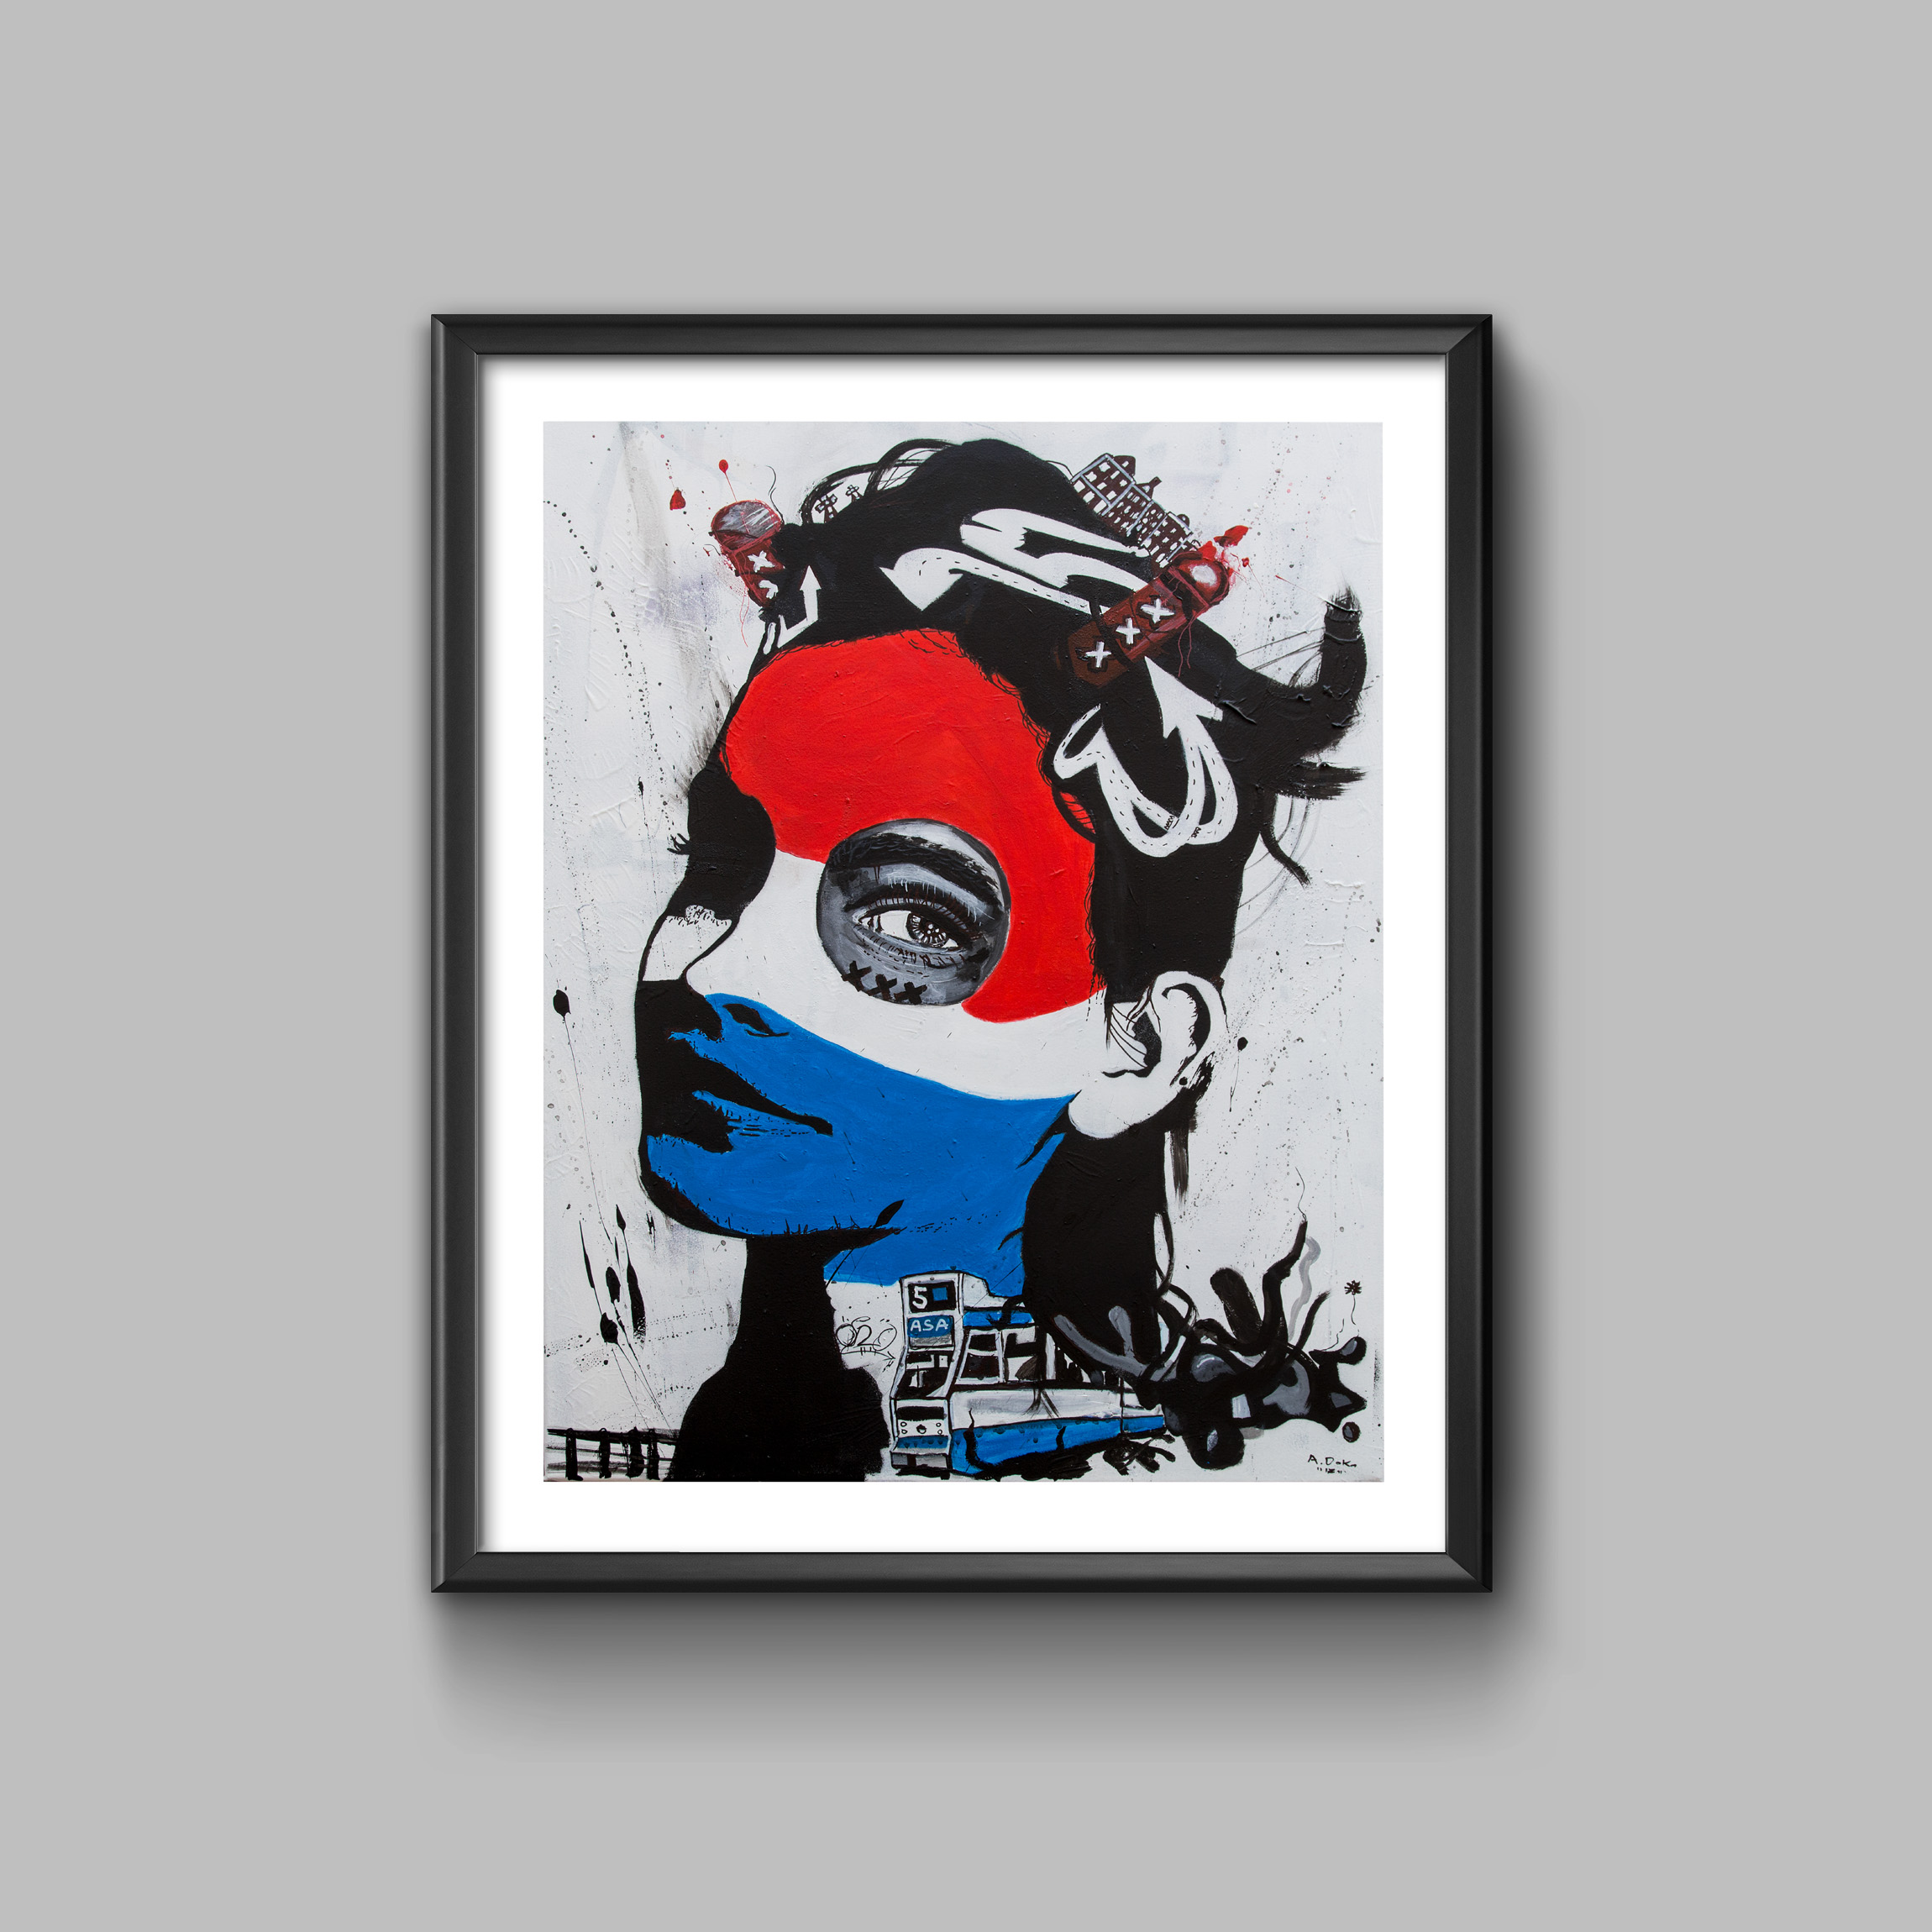 Amsterdamstreetart 2018, Print